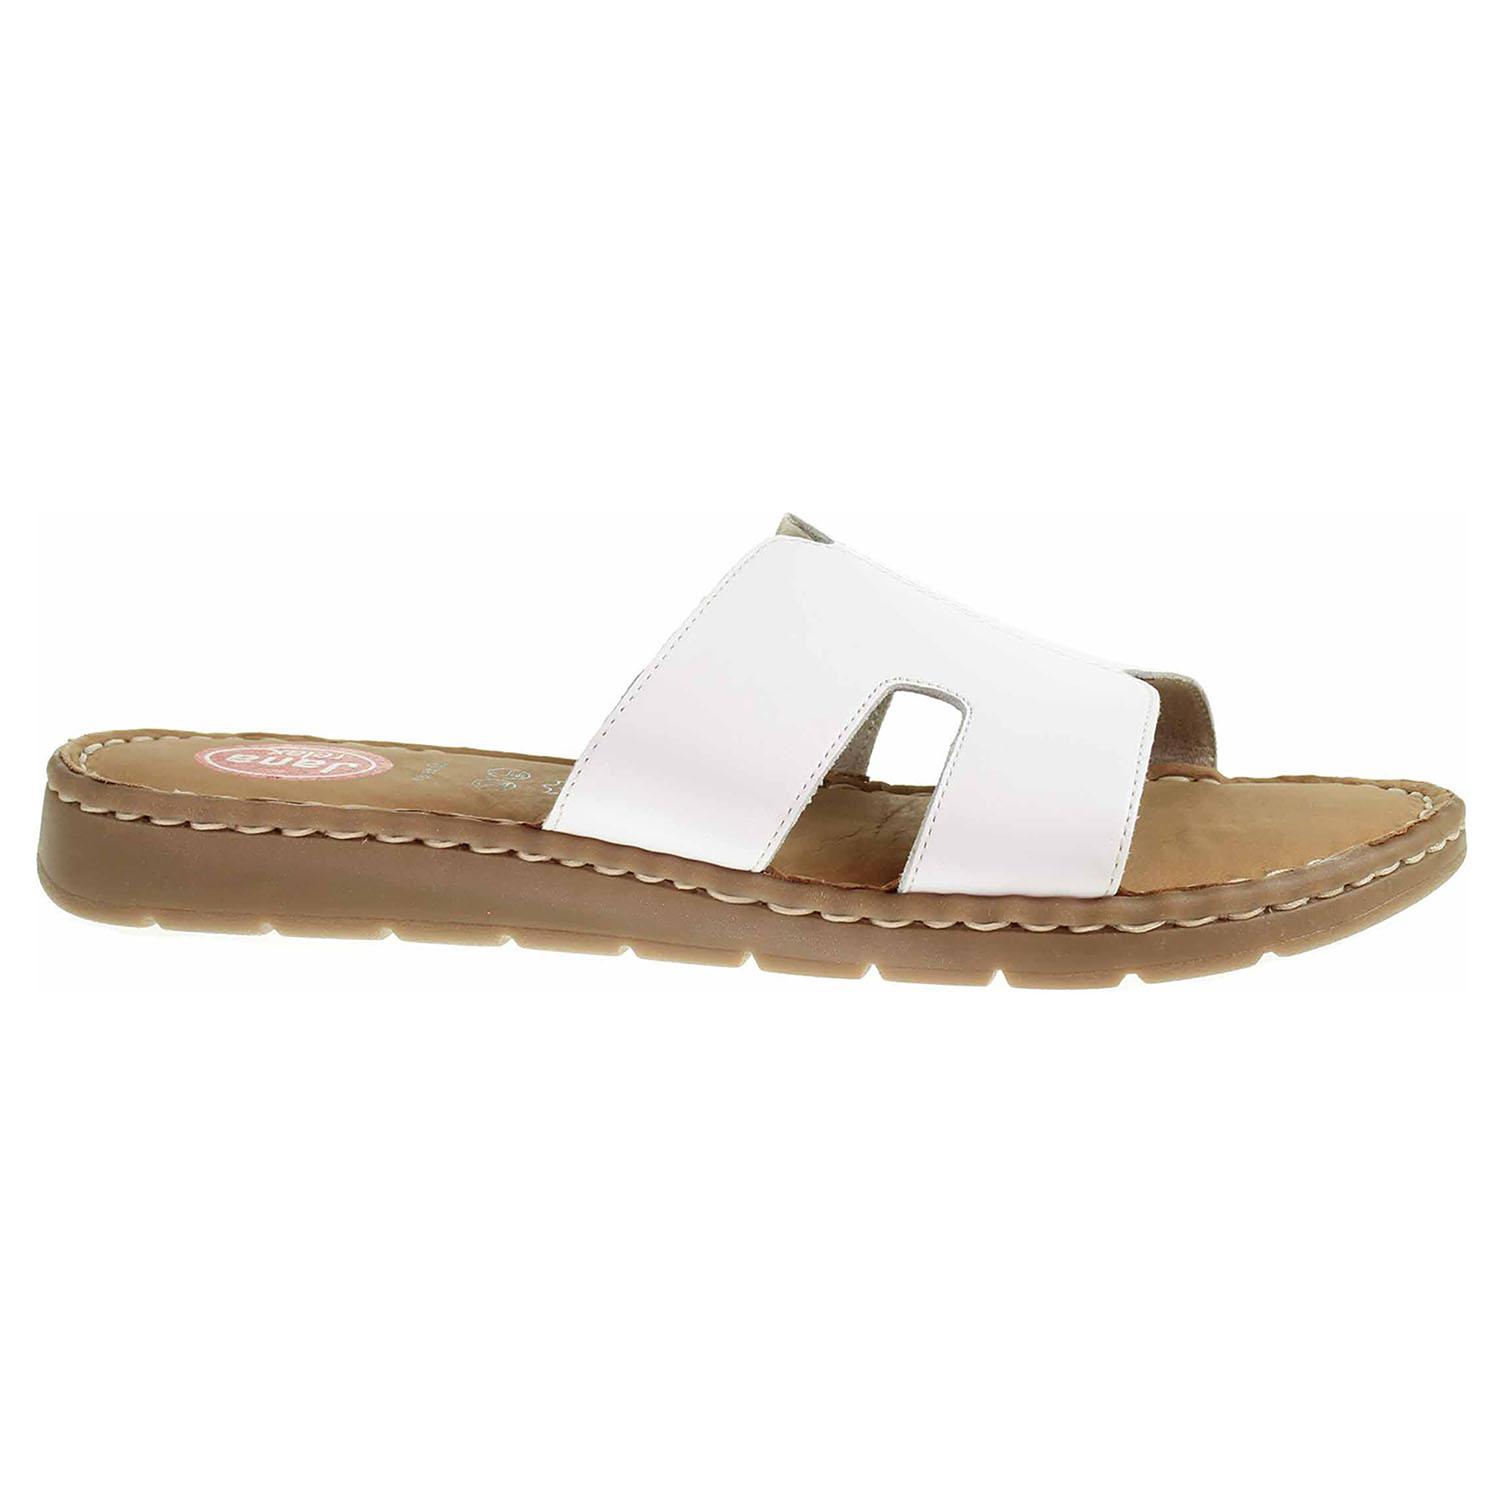 Dámské pantofle Jana 8-27115-26 white 8-8-27115-26 100 45